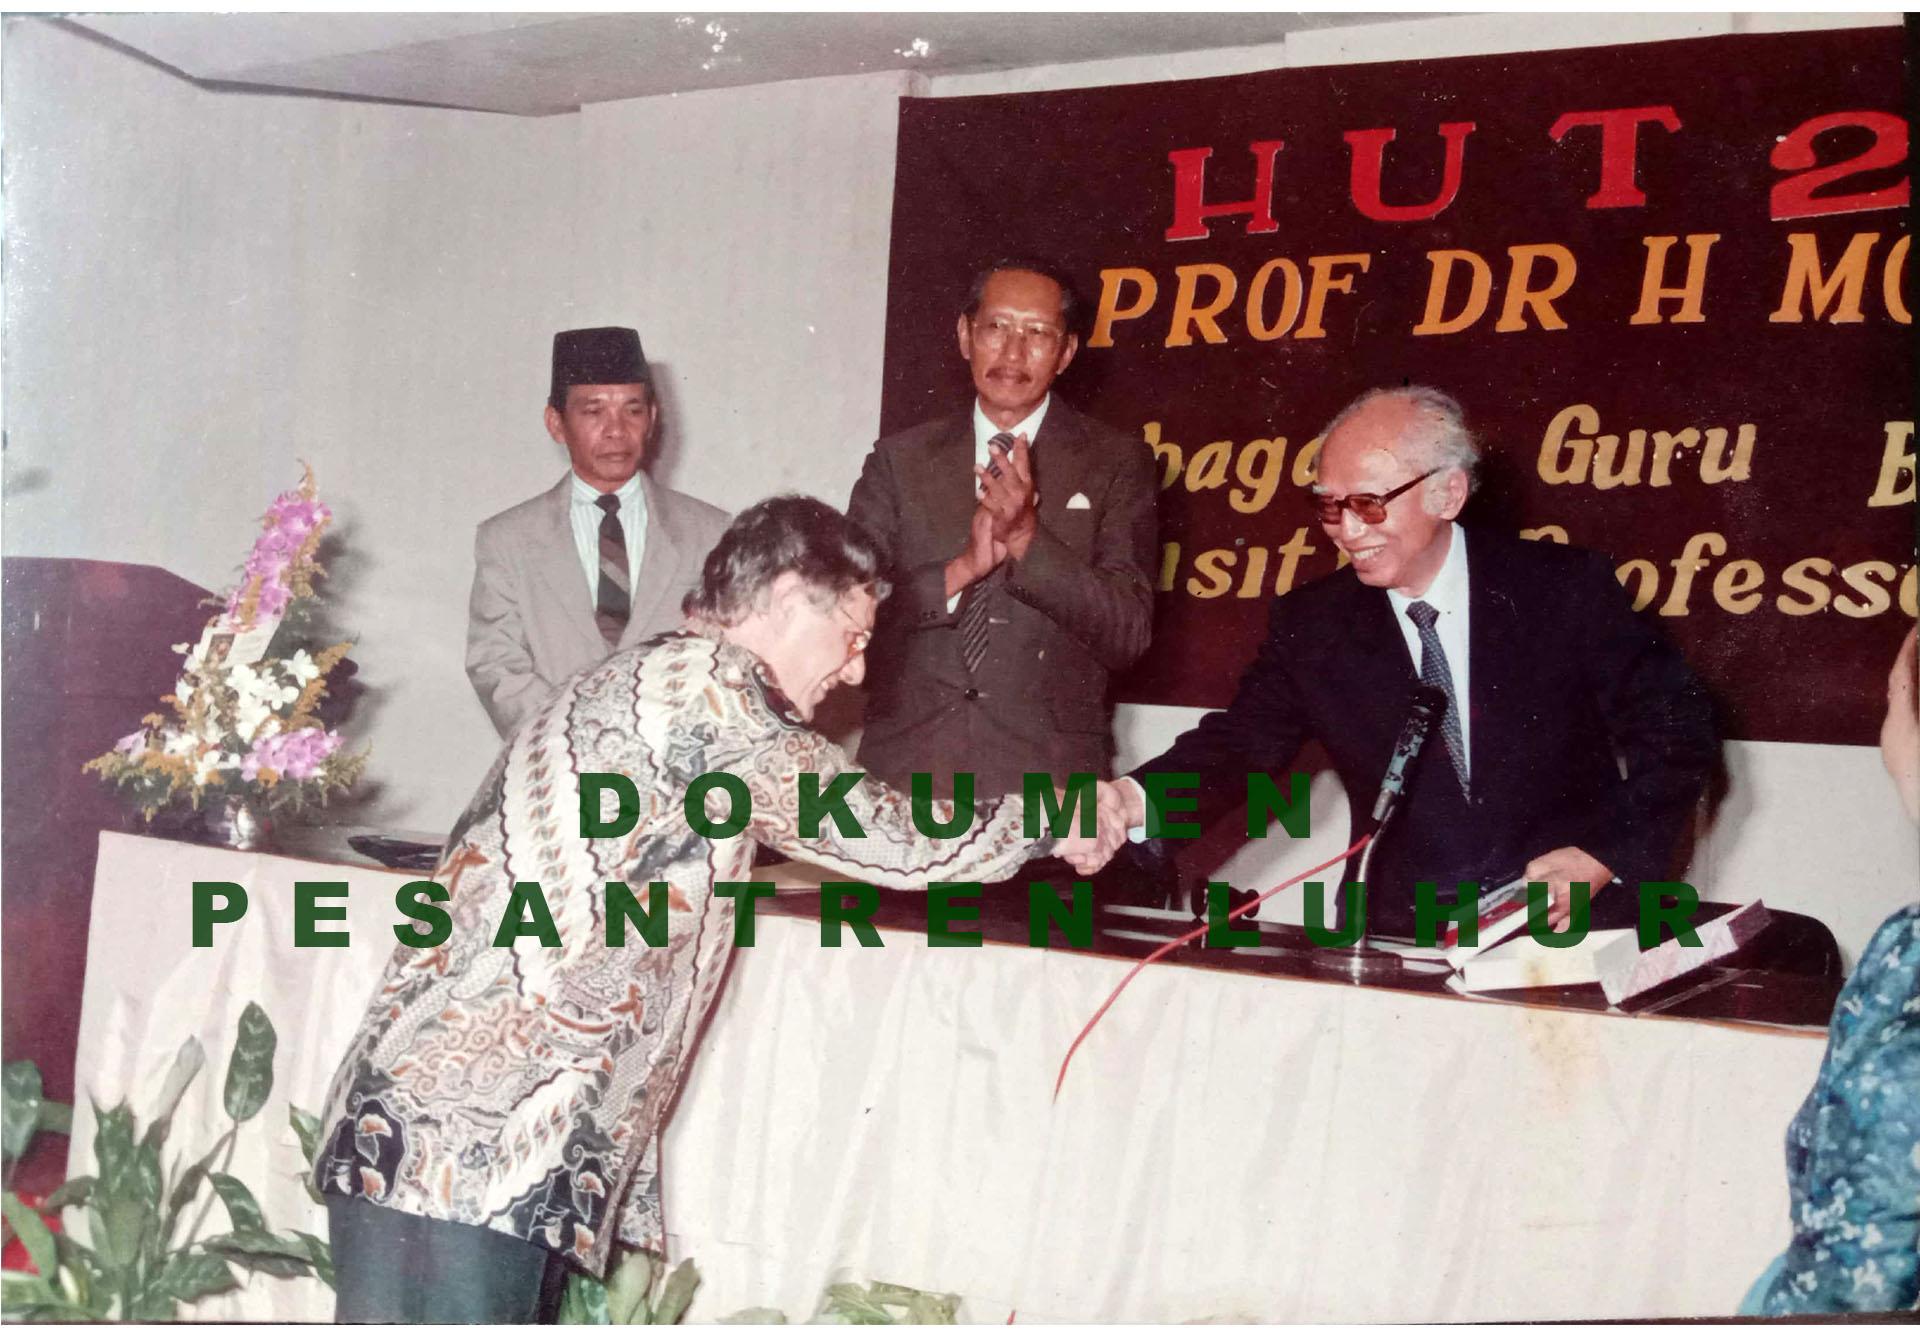 Prof. Dr. Moch Koesnoe yang sedang bersalaman dengan tamu dalam acara HUT 25 Tahun Prof. Dr. H. Moch Koesnoe Sebagai Guru Besar dan Visiting Professor di Hotel Pelangi